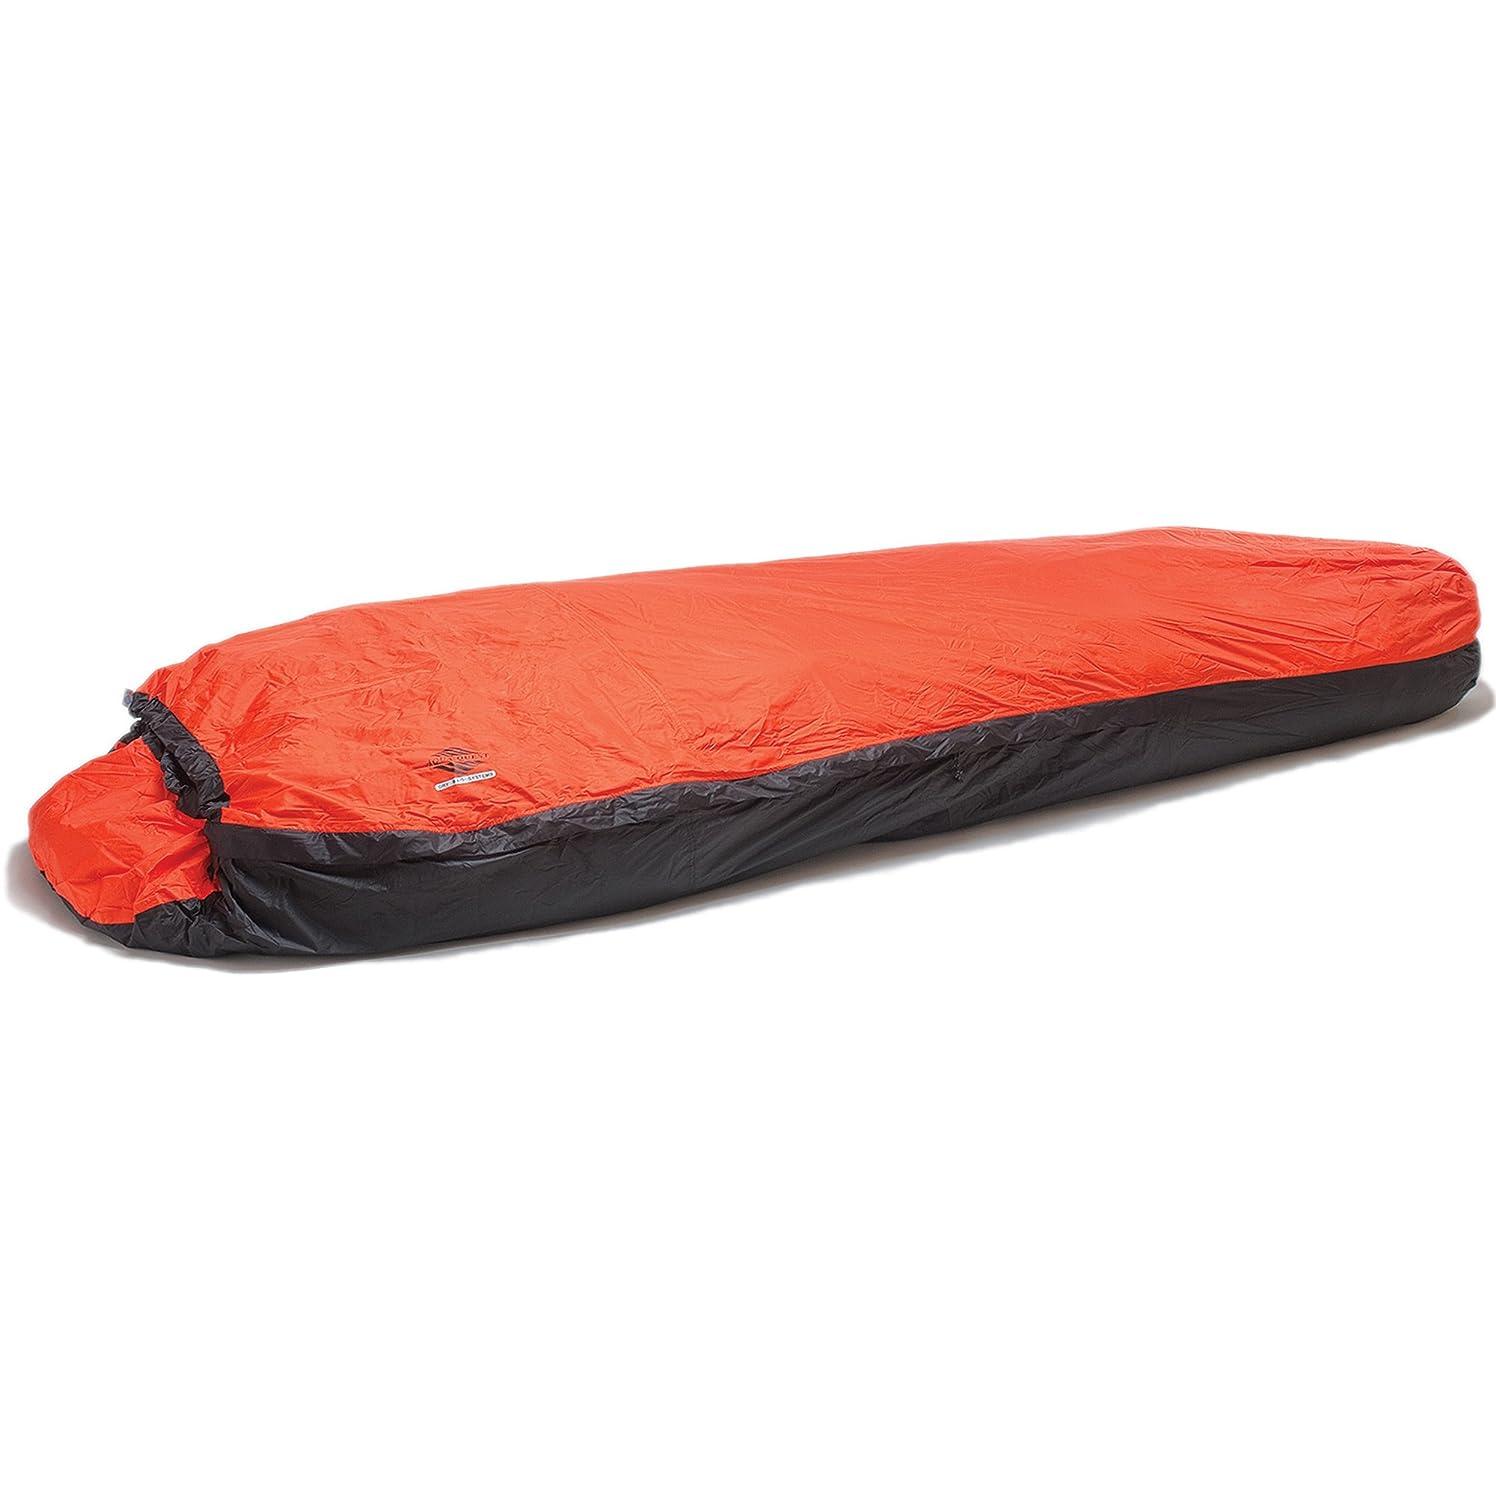 Aqua Quest Mummy Bivy Bag - 100% Waterproof Sleeping Bag Cover Lightweight Bivvy Sack for Outdoor Survival, Bushcraft